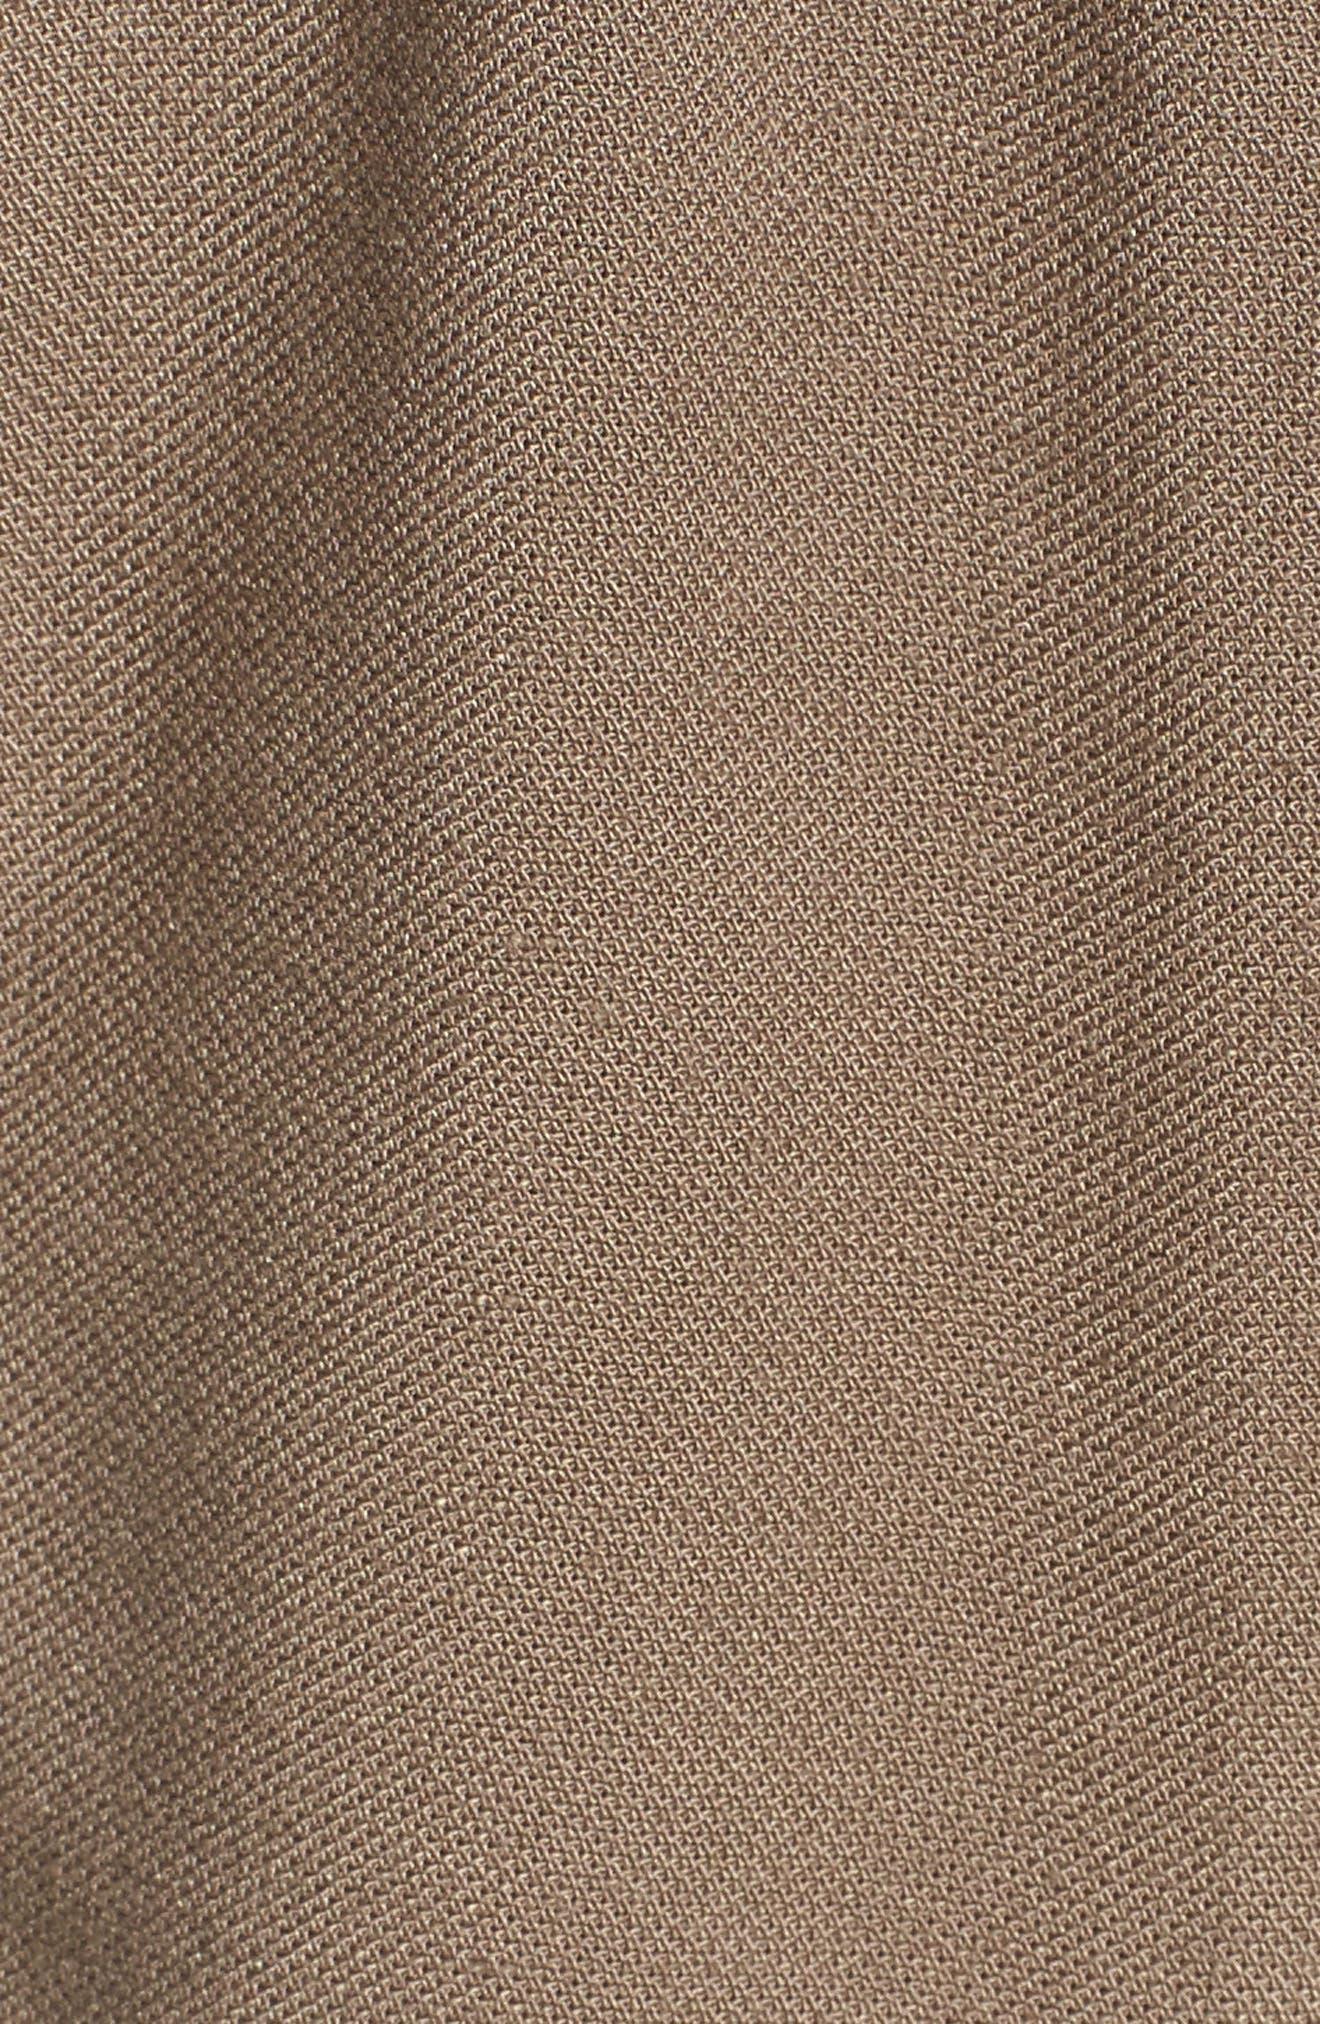 Drawstring Shorts,                             Alternate thumbnail 5, color,                             Brinde Olive